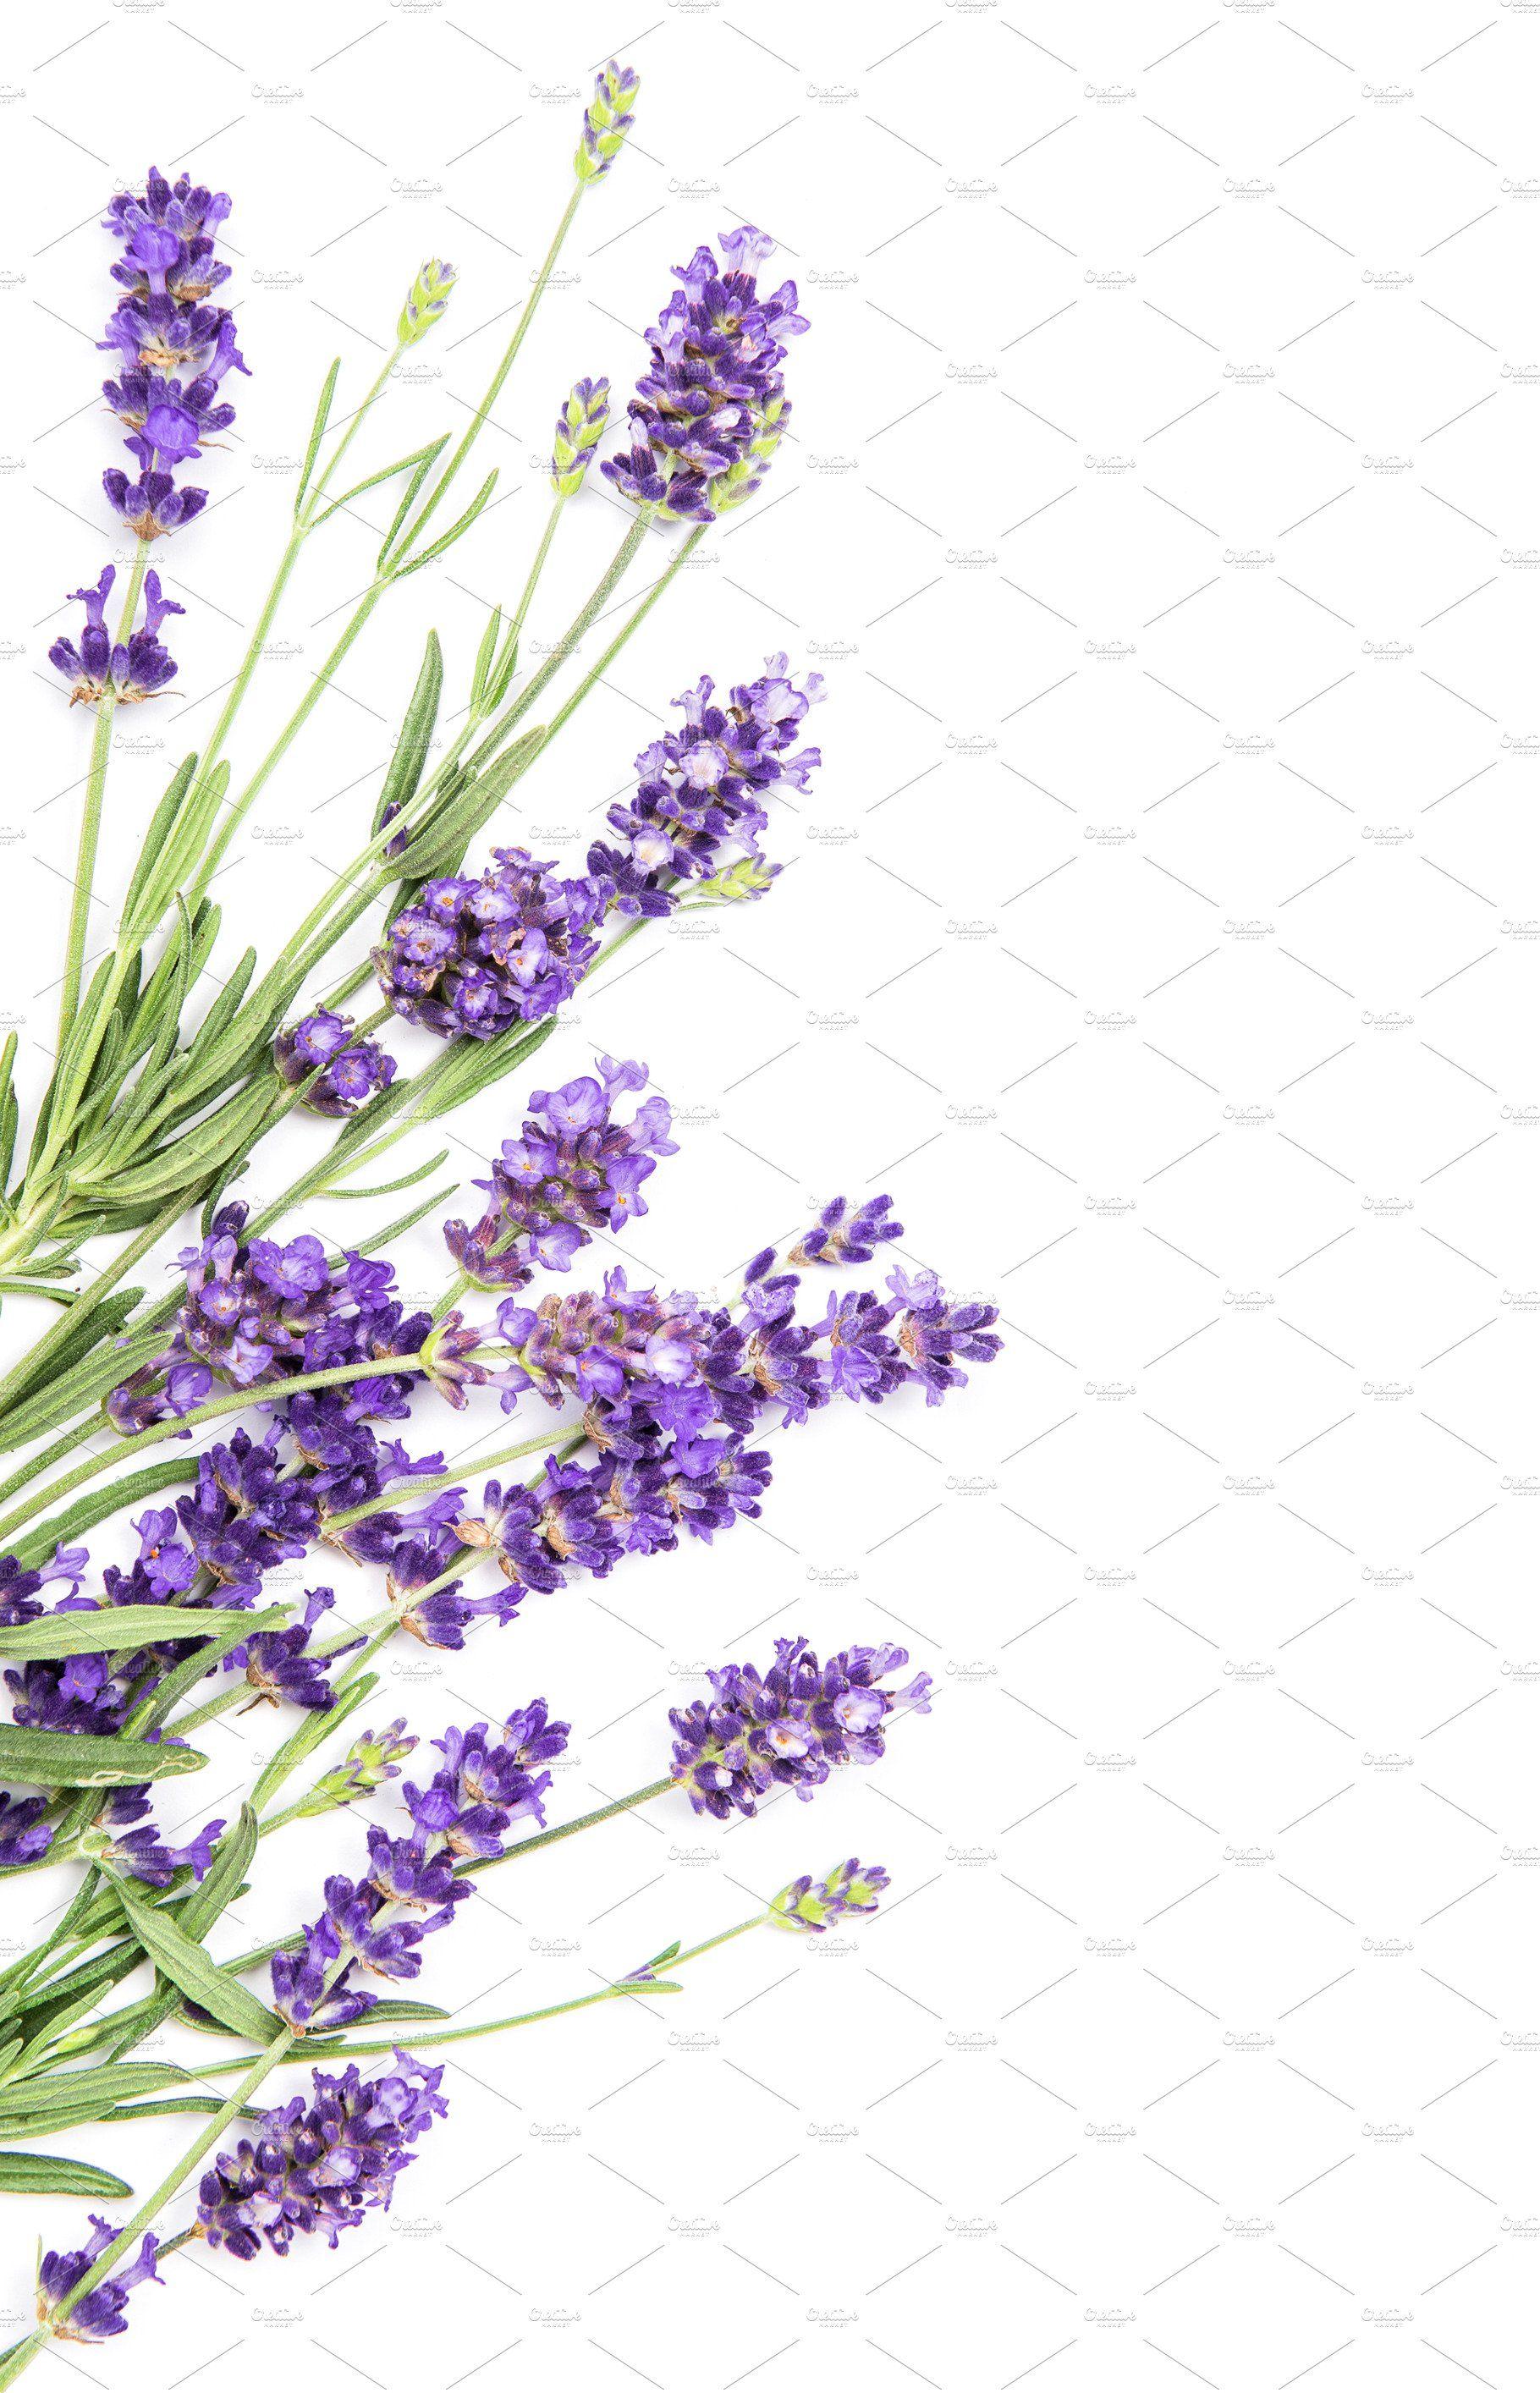 Lavender Flowers On White Background In 2020 Flower Pictures White Background Lavender Flowers